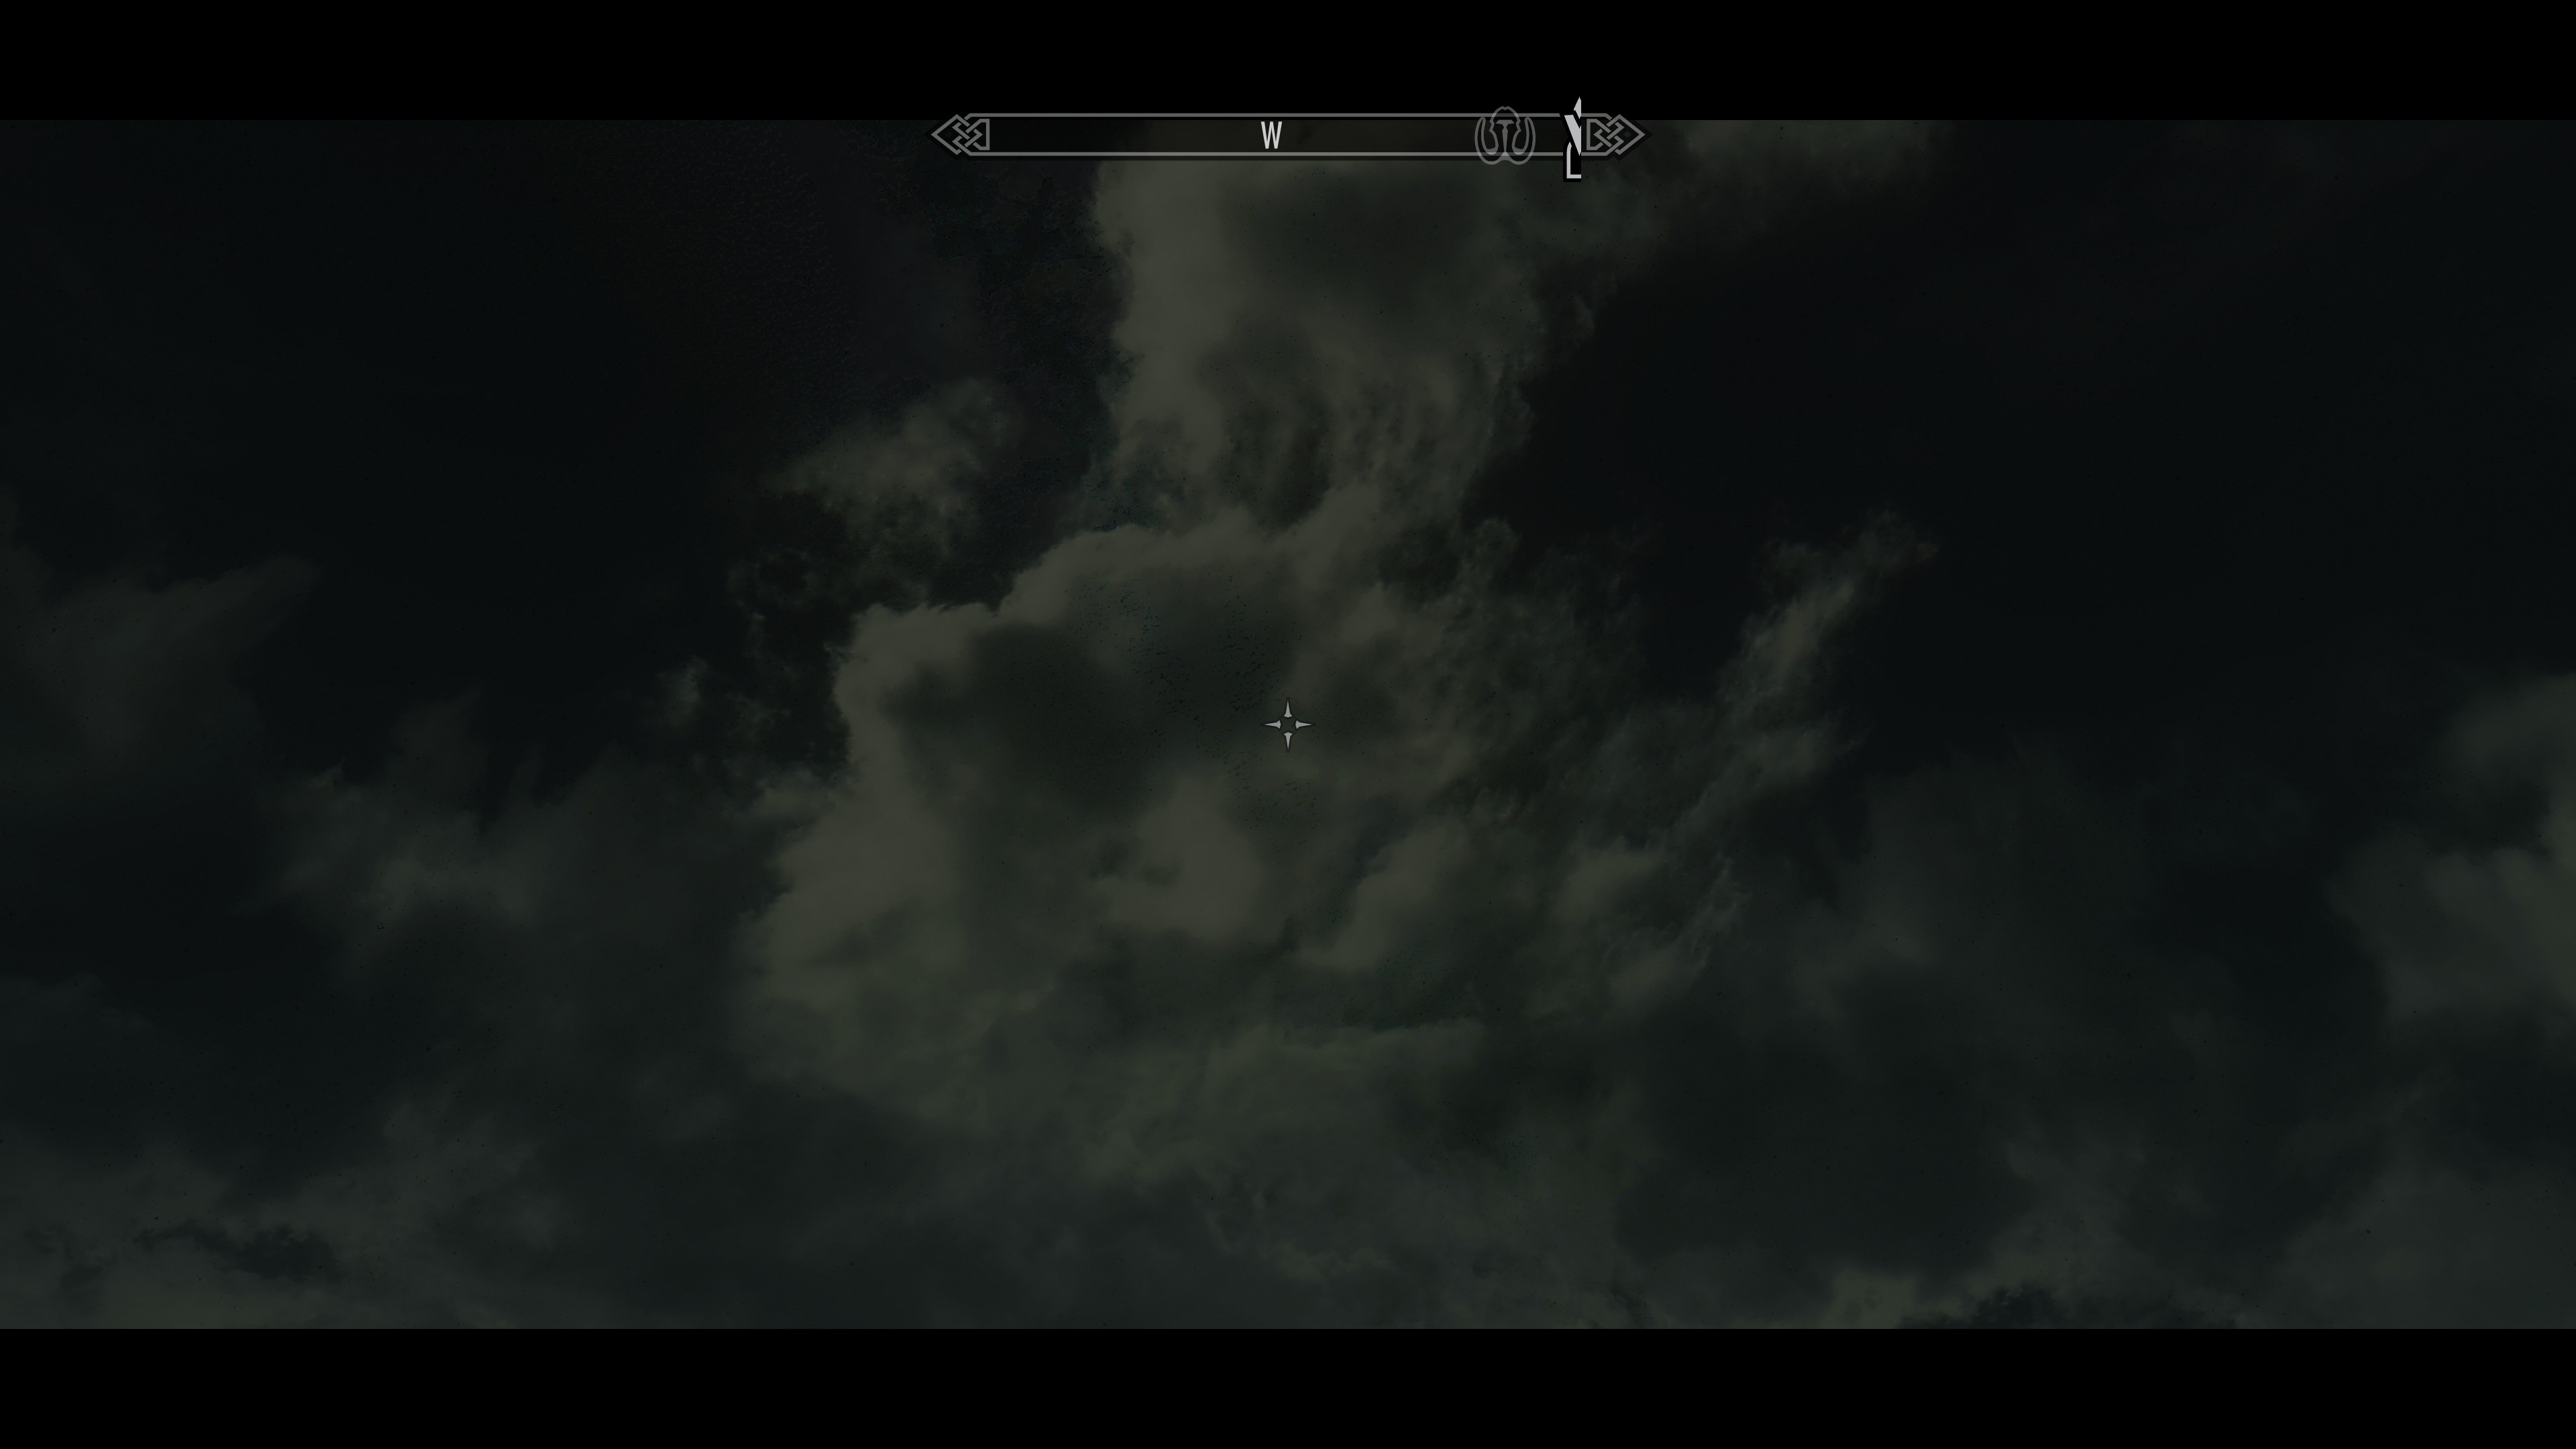 20191204202310_1.jpg - The Elder Scrolls 5: Skyrim